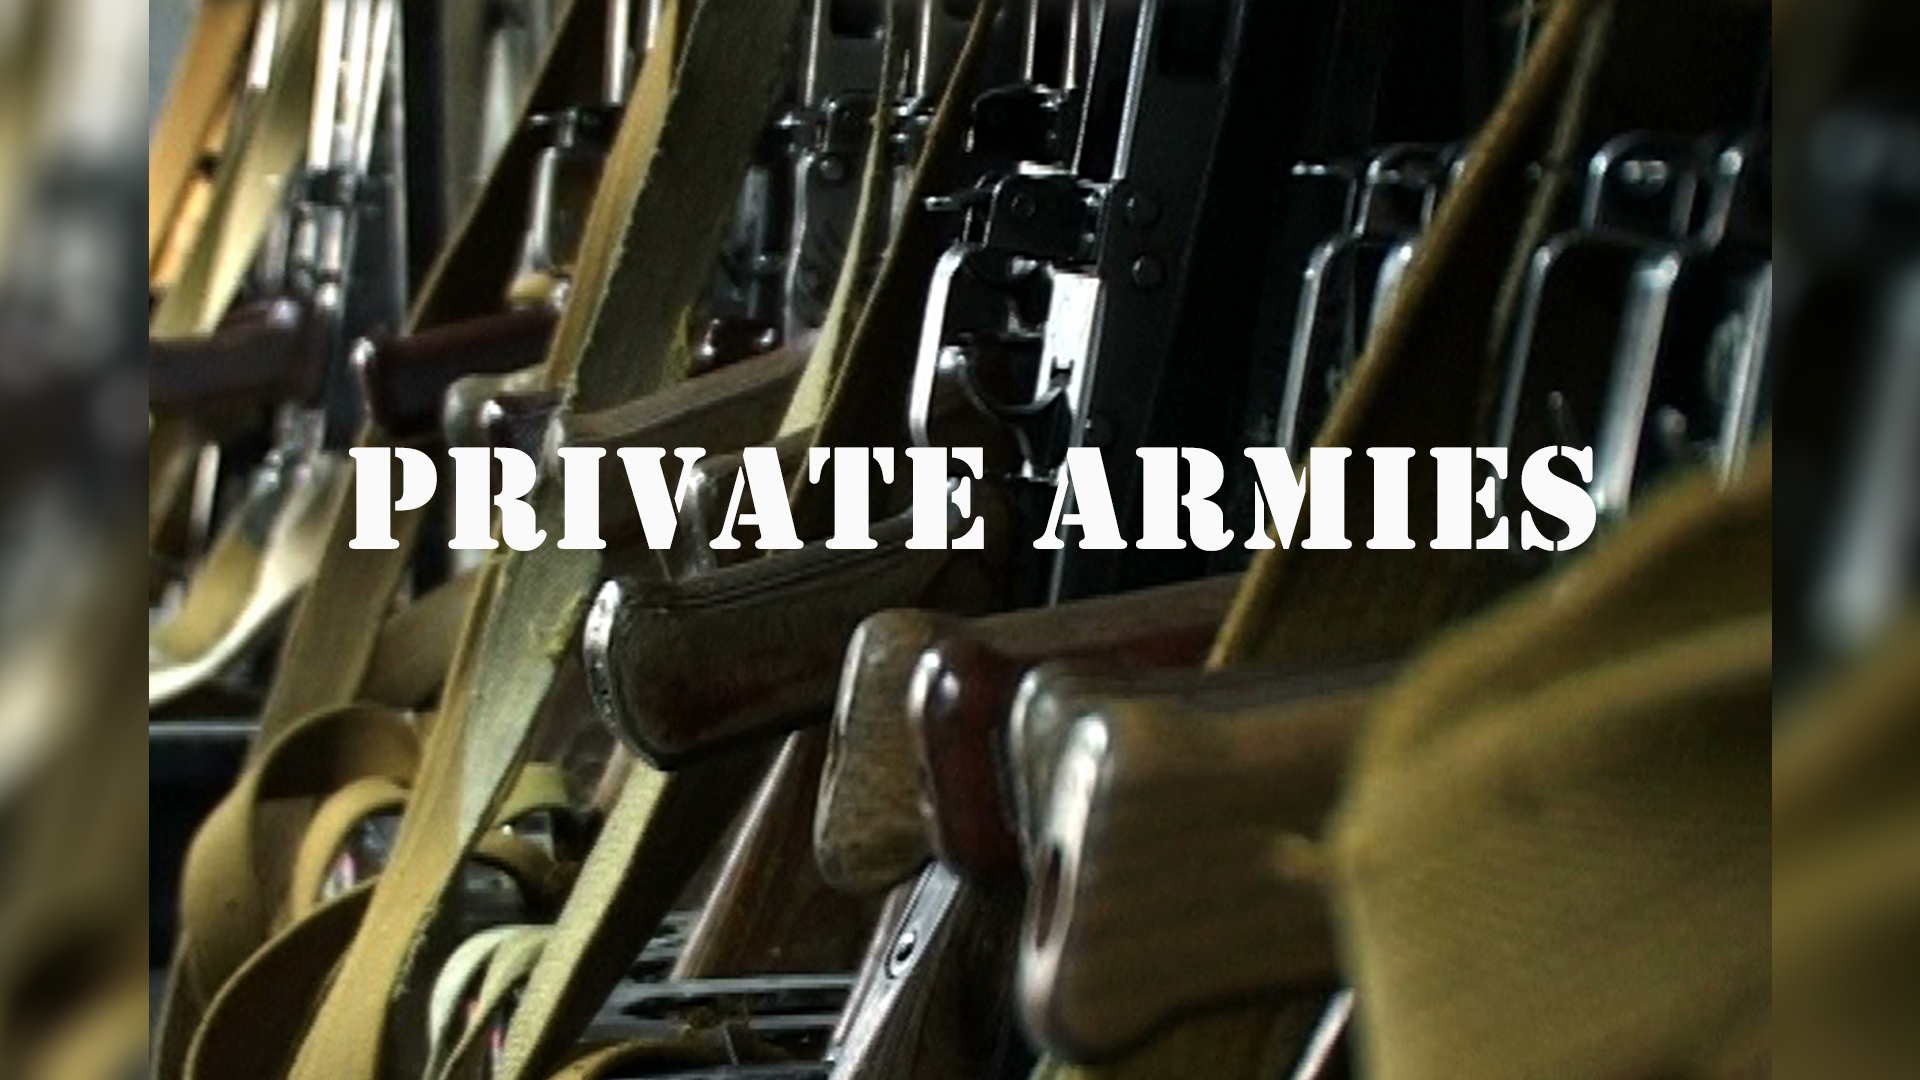 Private Armies